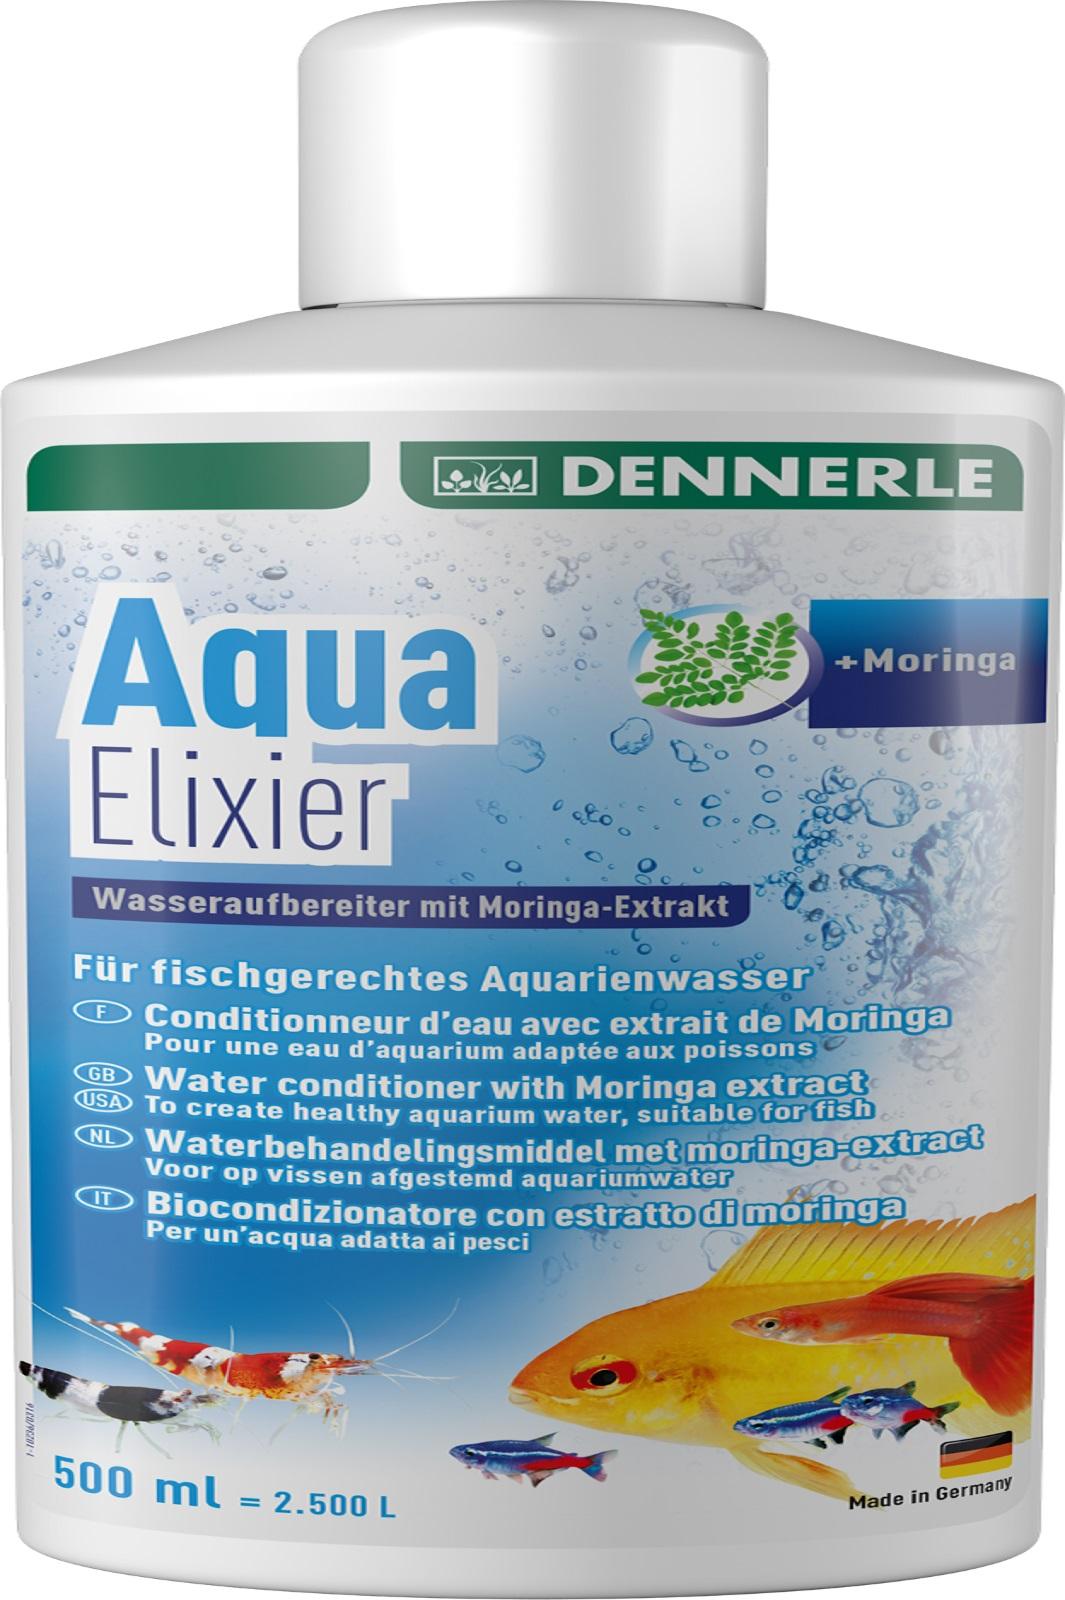 Dennerle Aqua Elixier Wasseraufbereiter 500 ml